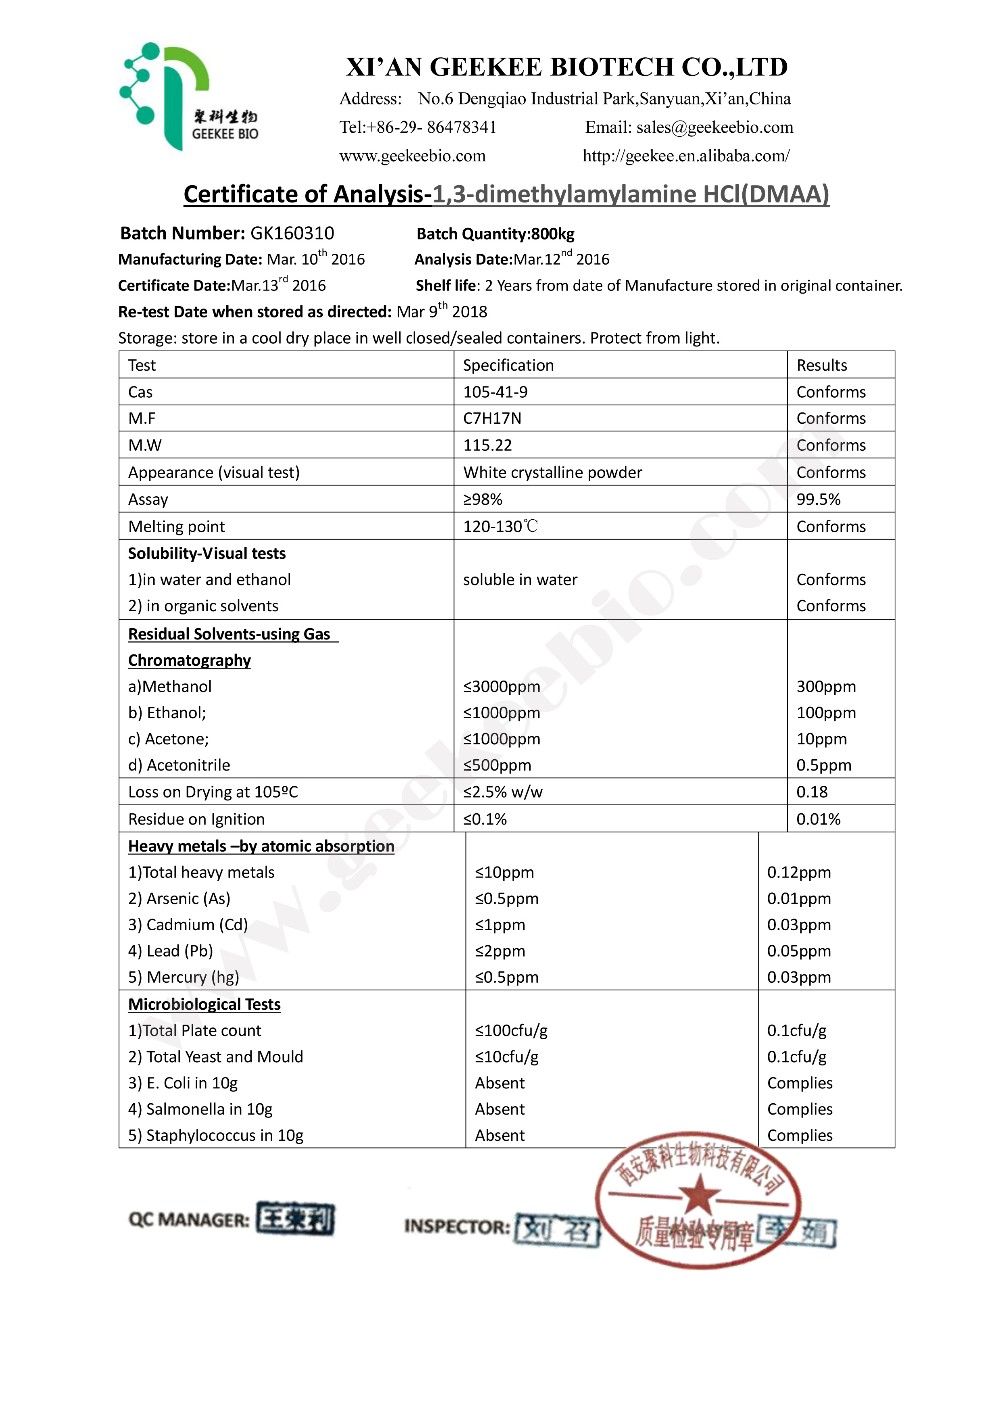 High Purity Pure Dmaa Powder 1 3 Dimethylamylamine With Best Price - Buy 1  3 Dimethylamylamine Hcl,Pure Dmaa Powder,Pure Dmaa Powder For Sale Product